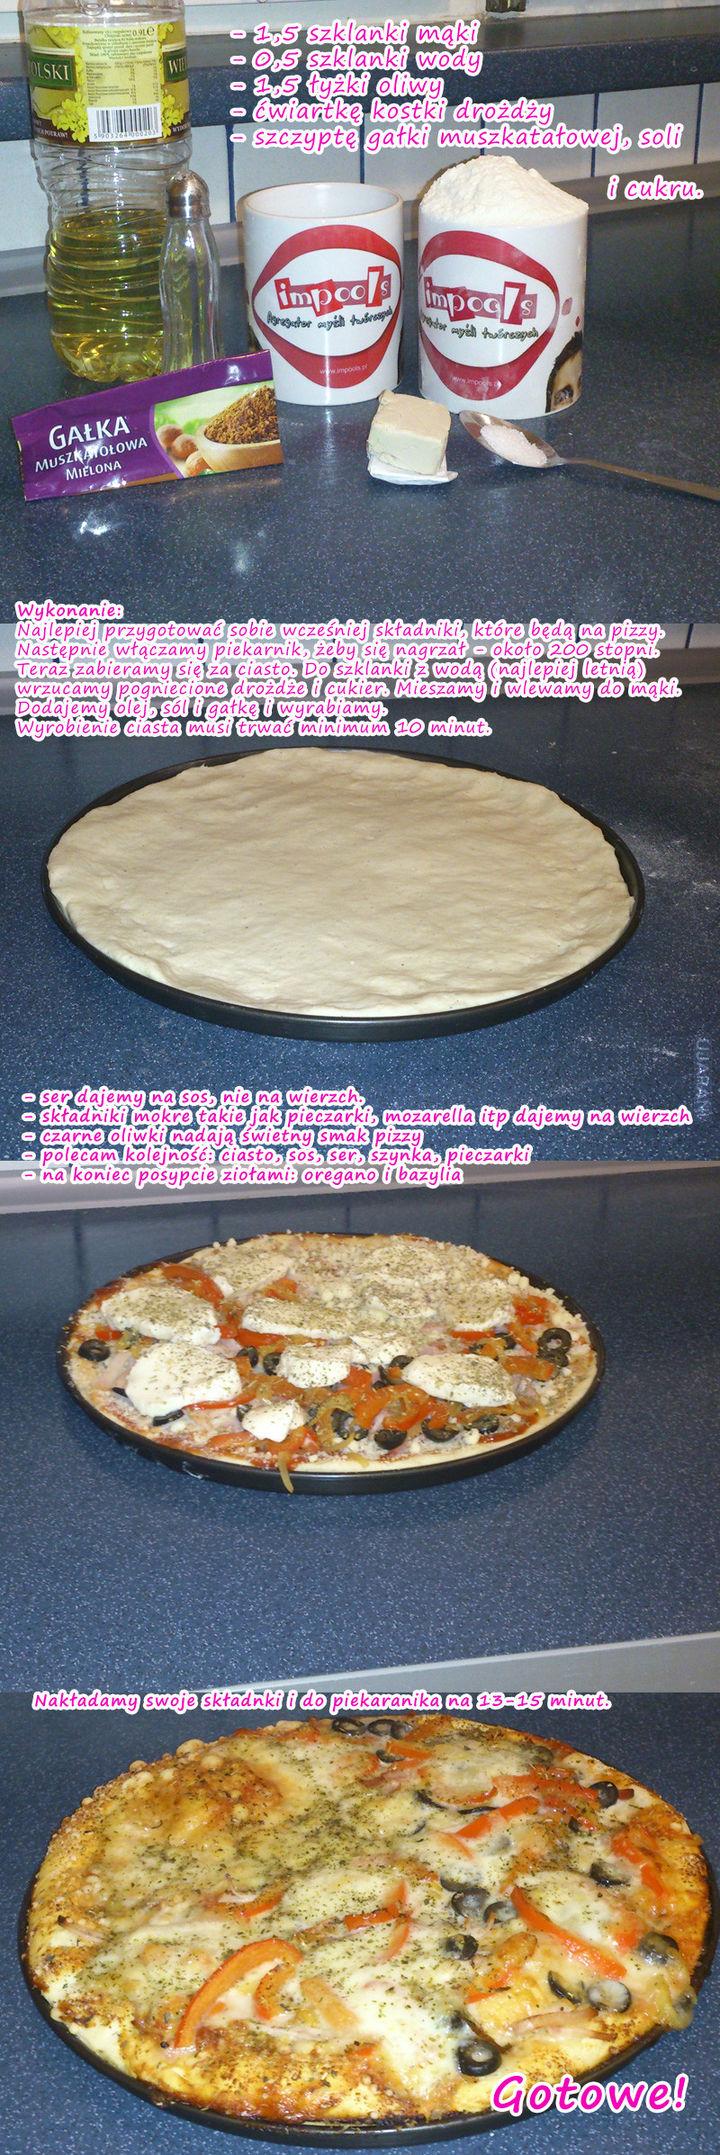 Najlepsze ciasto na pizzę